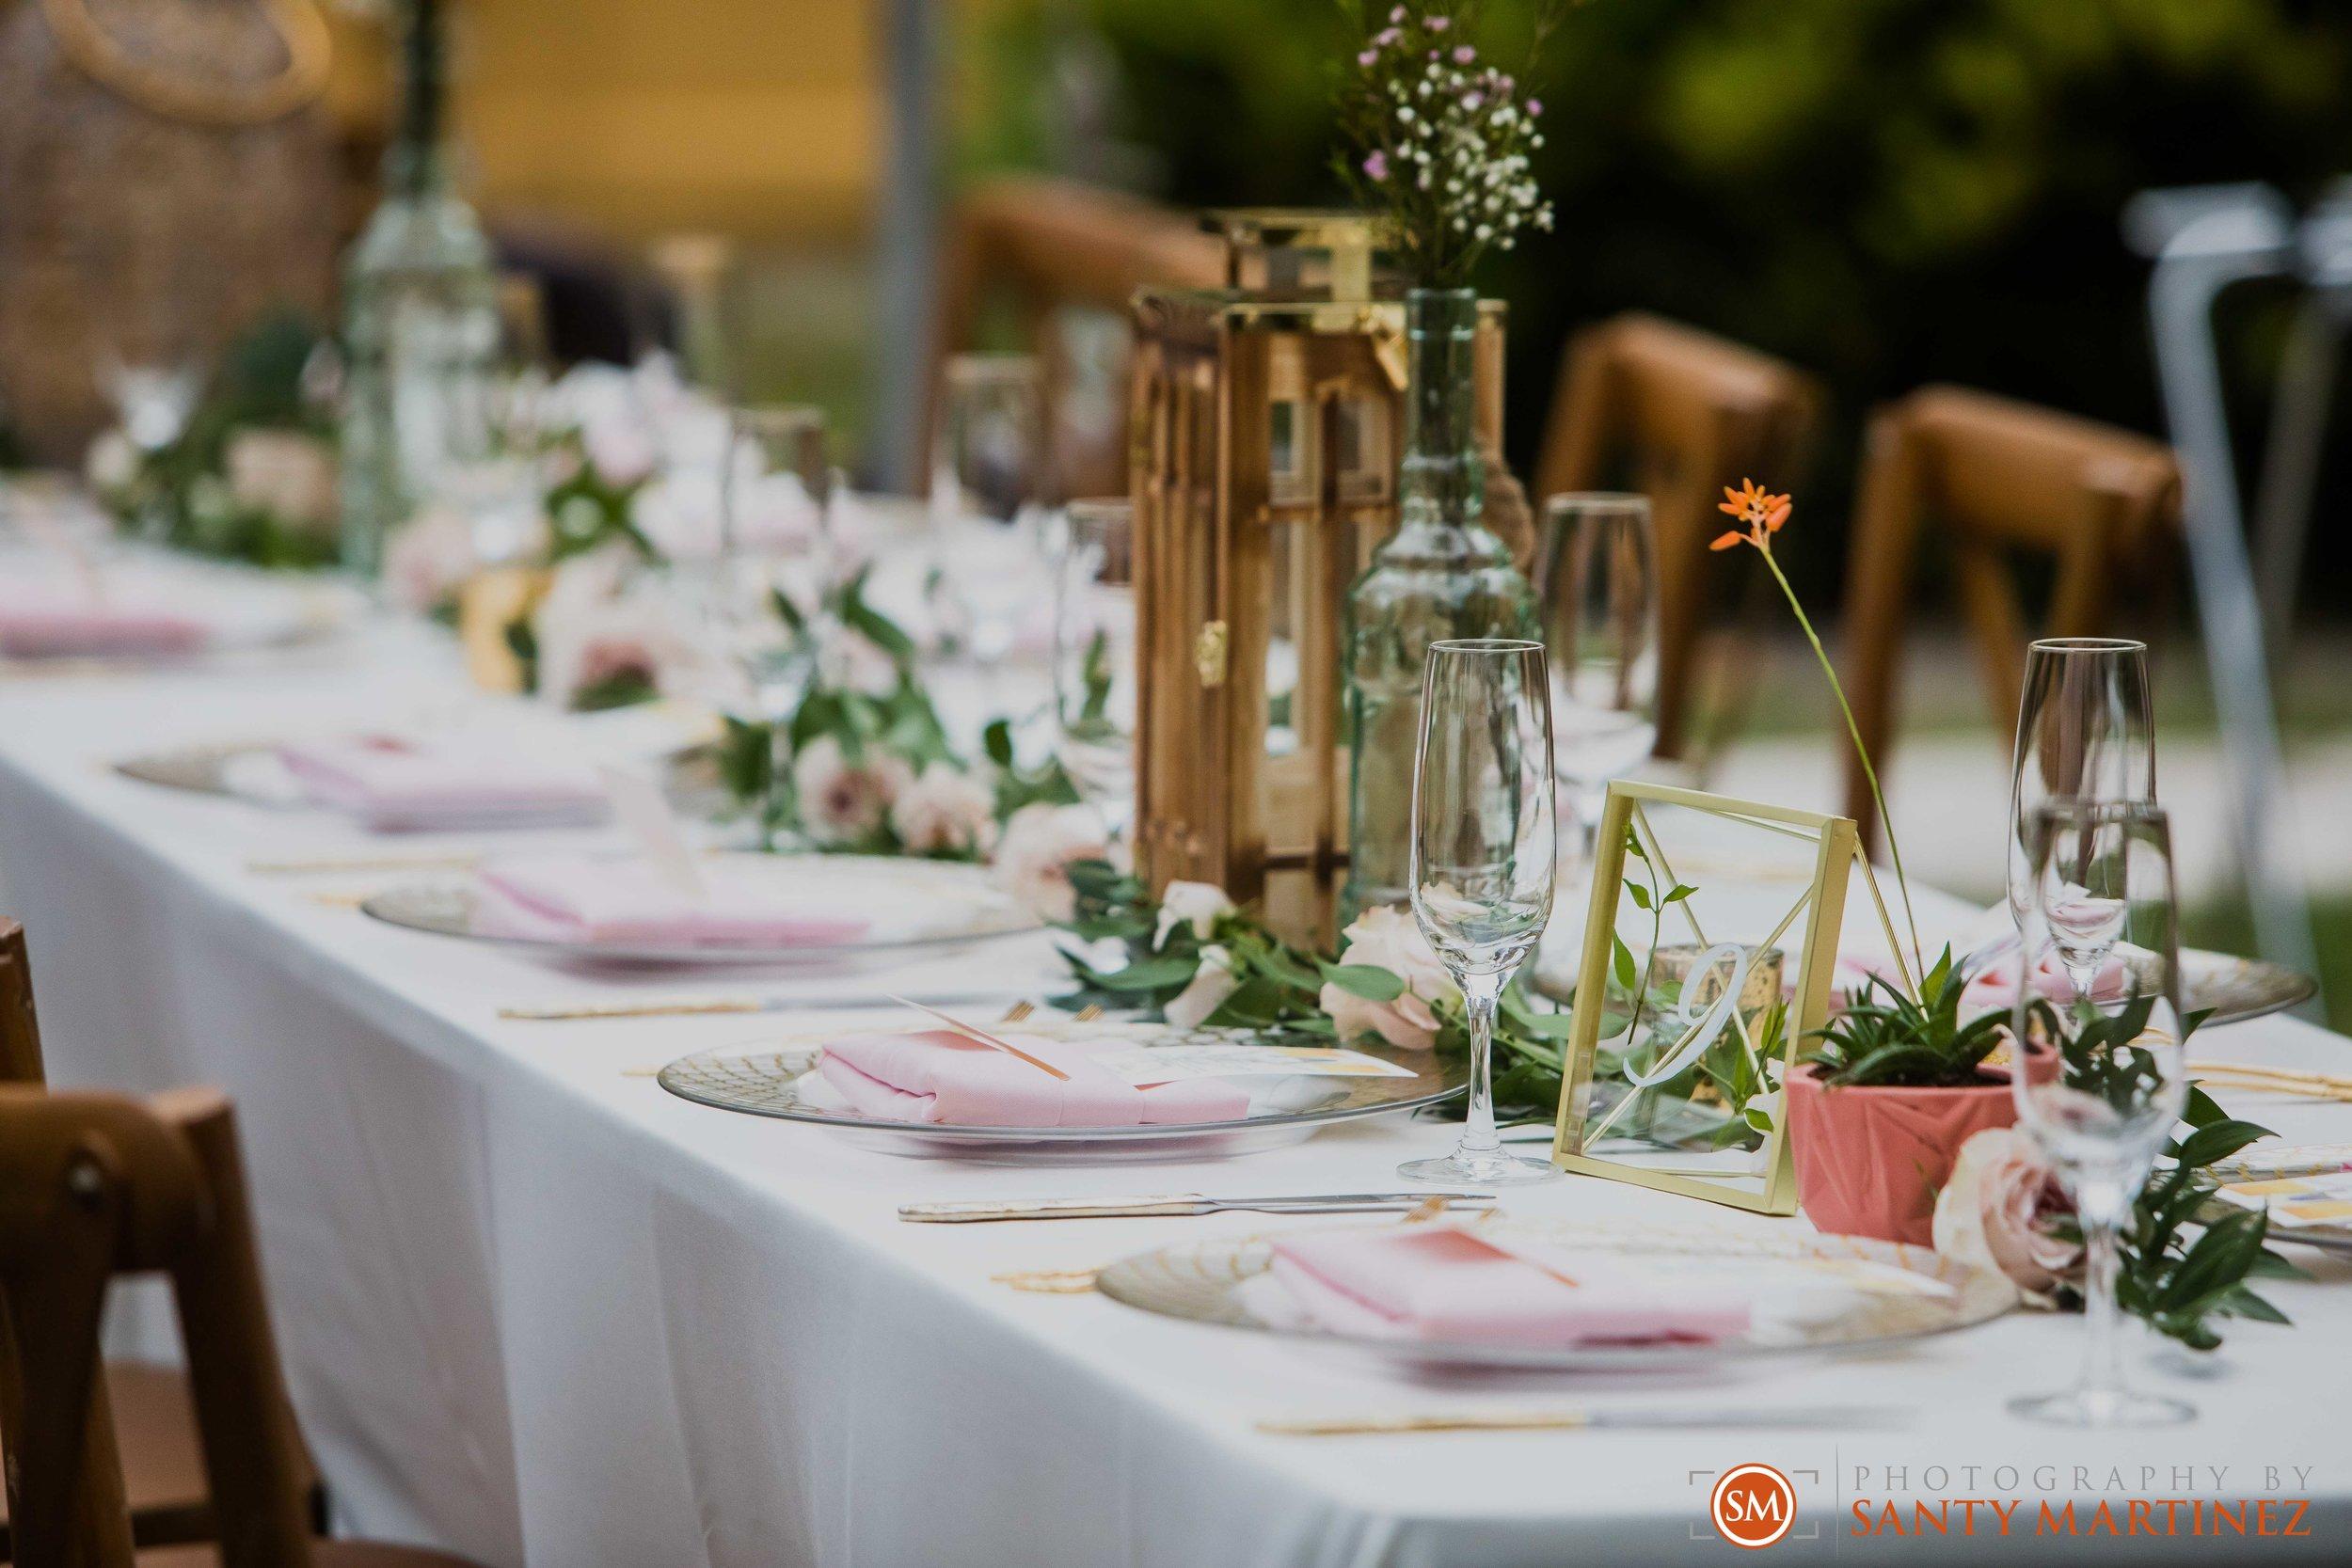 Wedding Bonnet House - Santy Martinez Photography-44.jpg